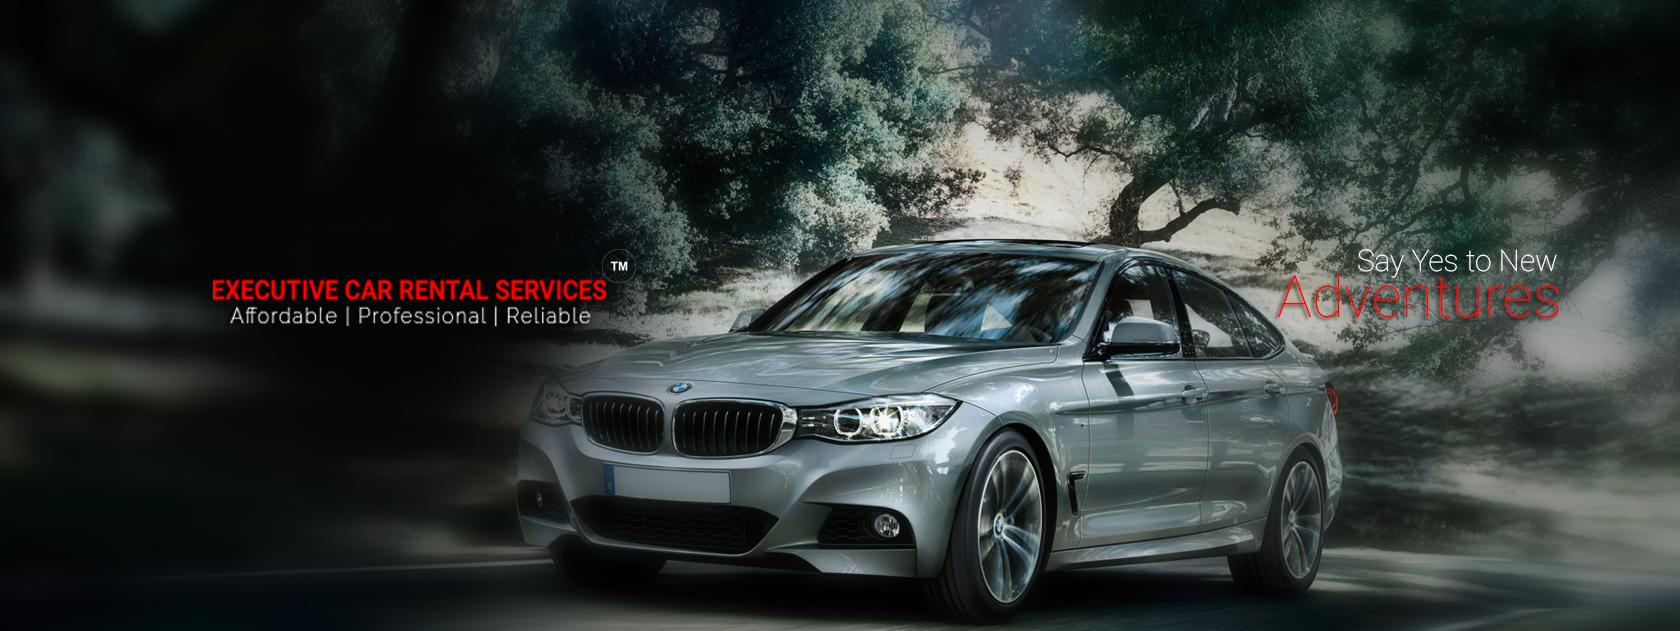 Ecrspune Home Executive Car Rental Services